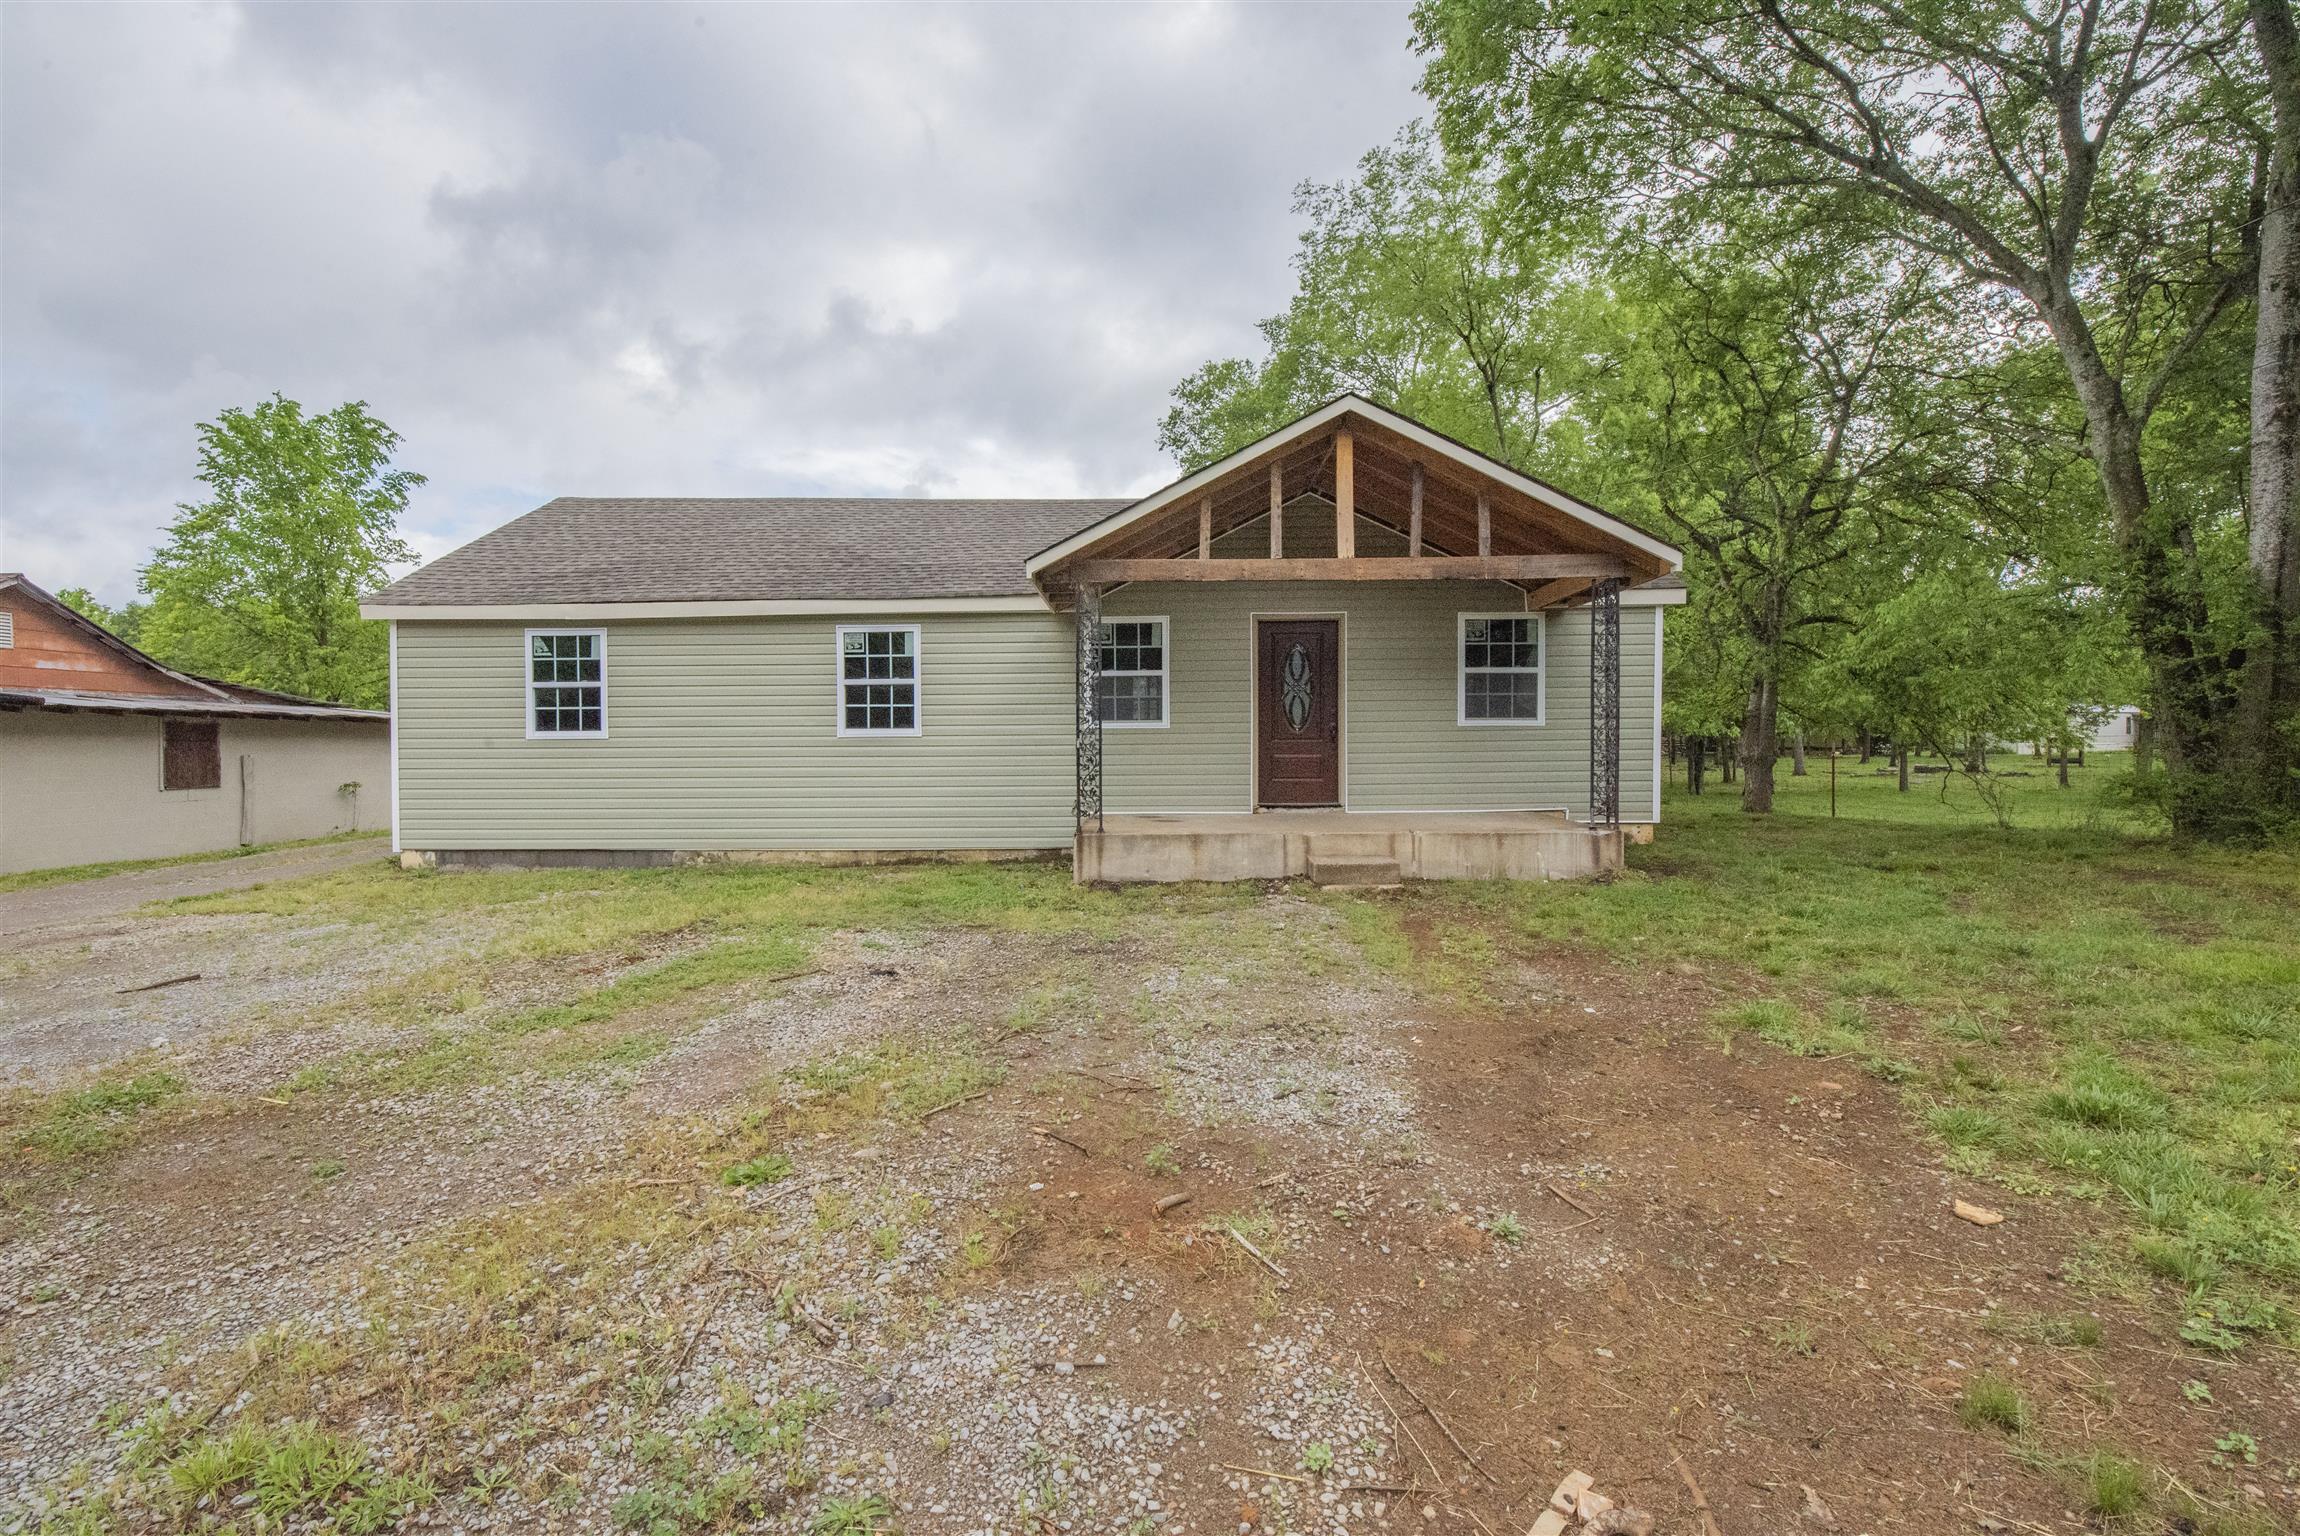 4411 Woodbury Pike, Murfreesboro, TN 37127 - Murfreesboro, TN real estate listing